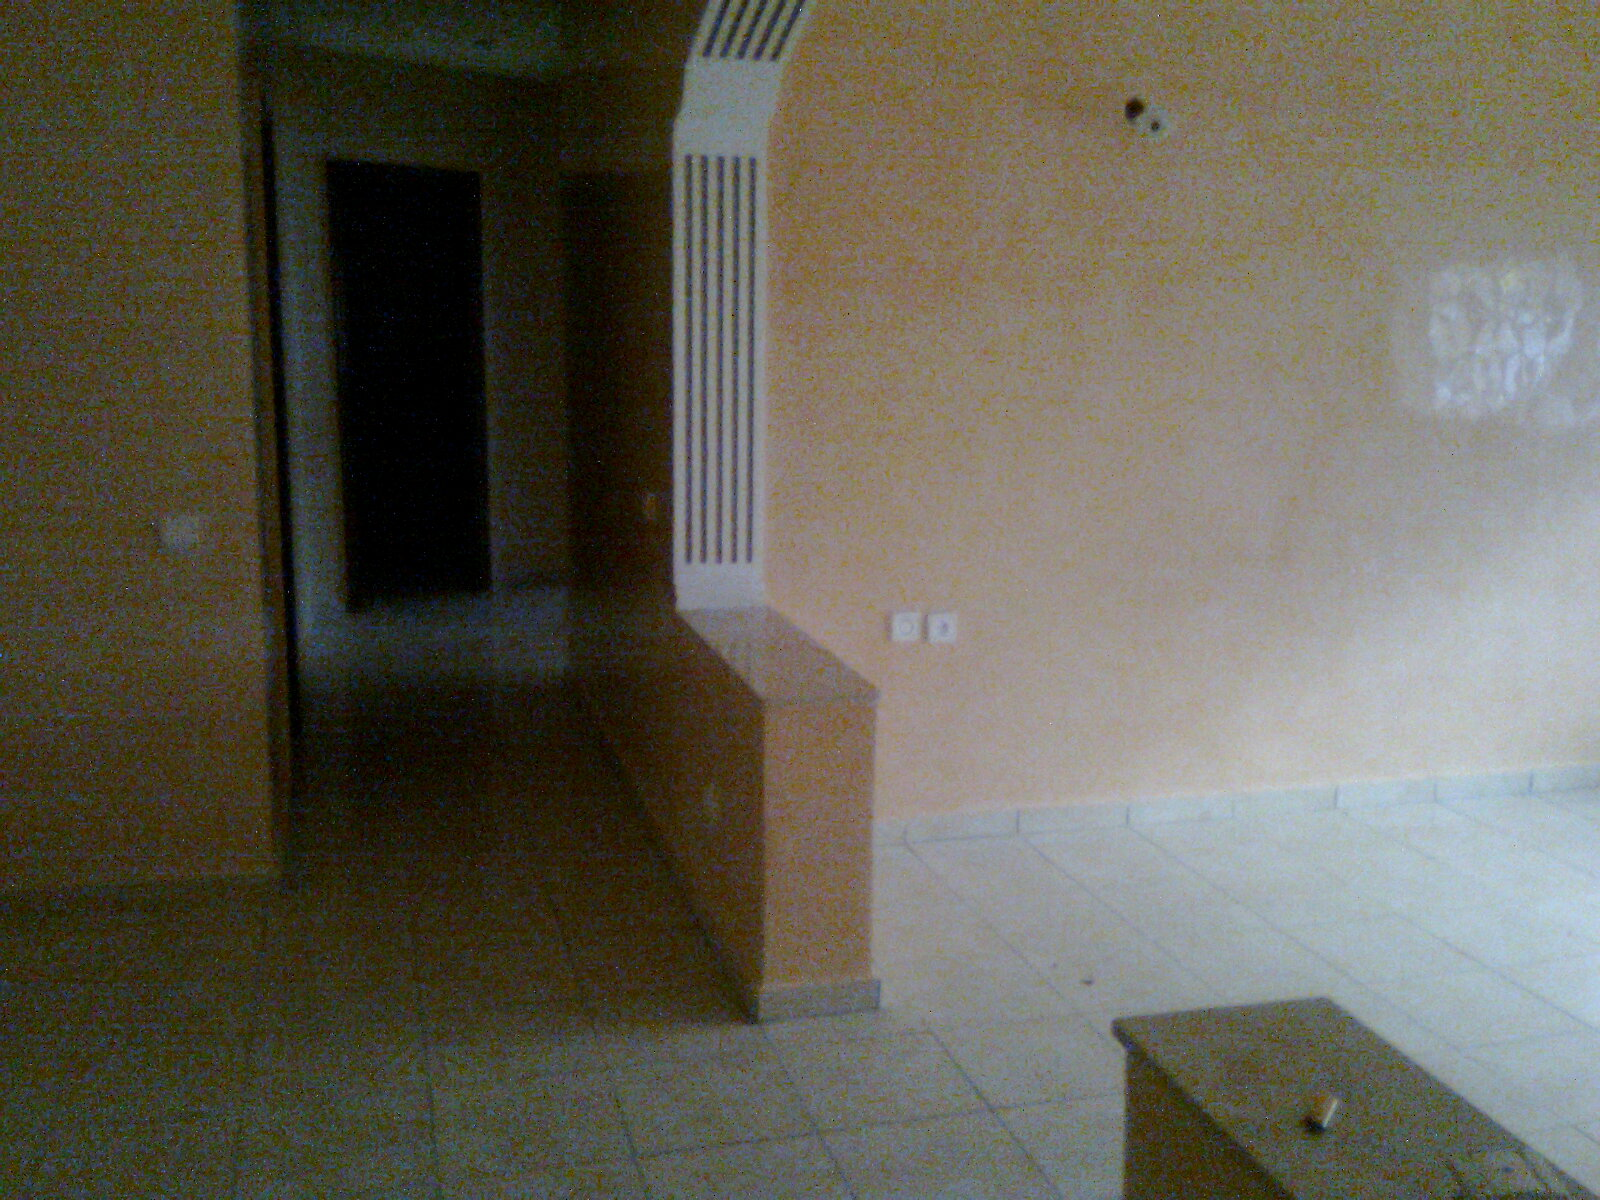 Appartement à vendre à casablanca maroc taddart vente appartement ...